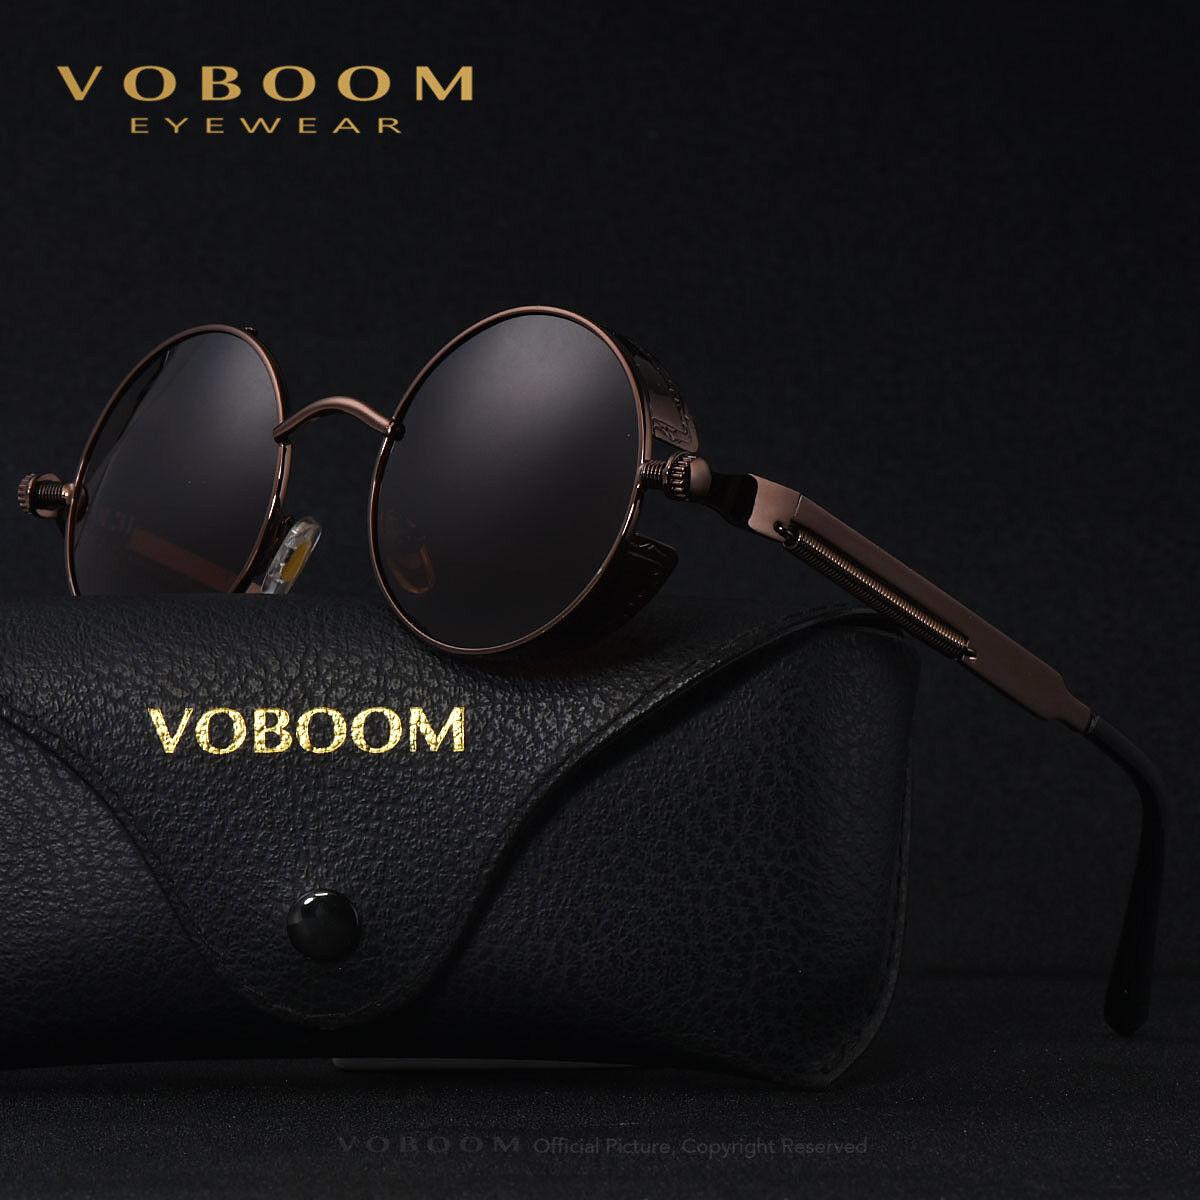 Oldschool Flat Top Sonnenbrille Retro Vintage Sunglasses Brille Verspiegelt